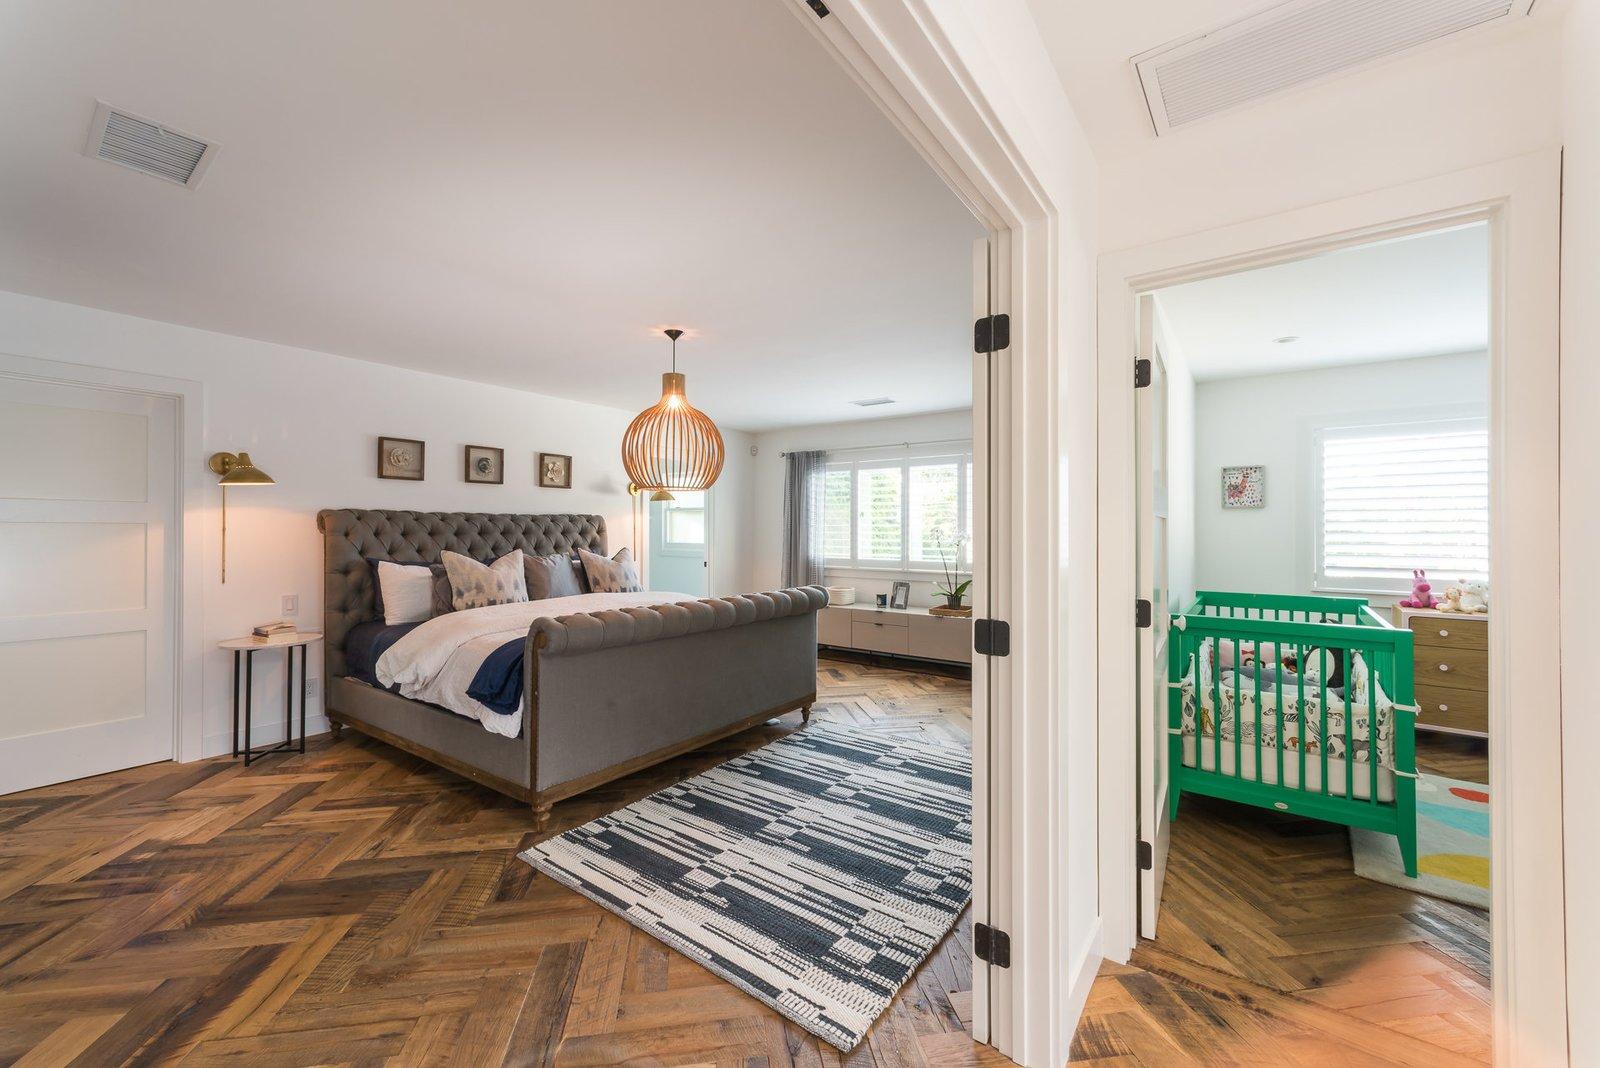 Bedroom, Medium Hardwood Floor, and Bed  Mid-Century Meets Boho Chic